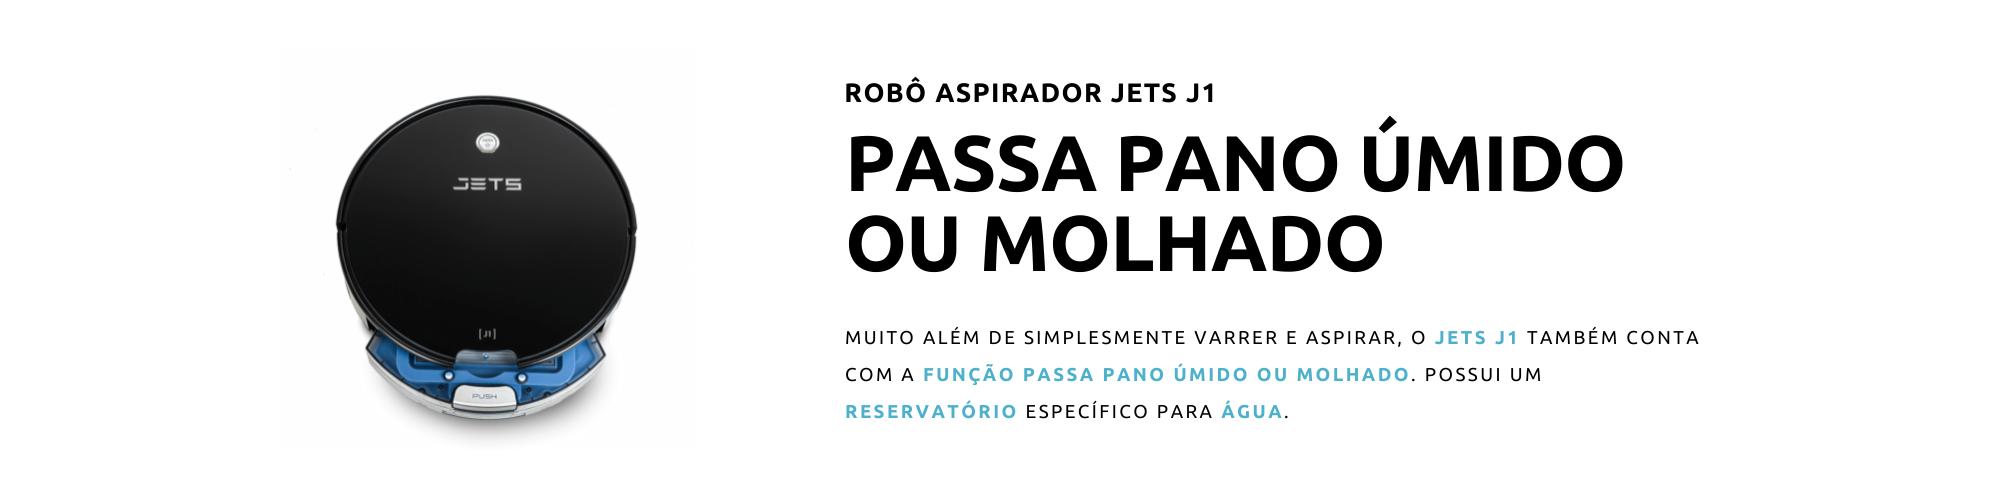 JETS J1 - PASSA PANO ÚMIDO OU MOLHADO